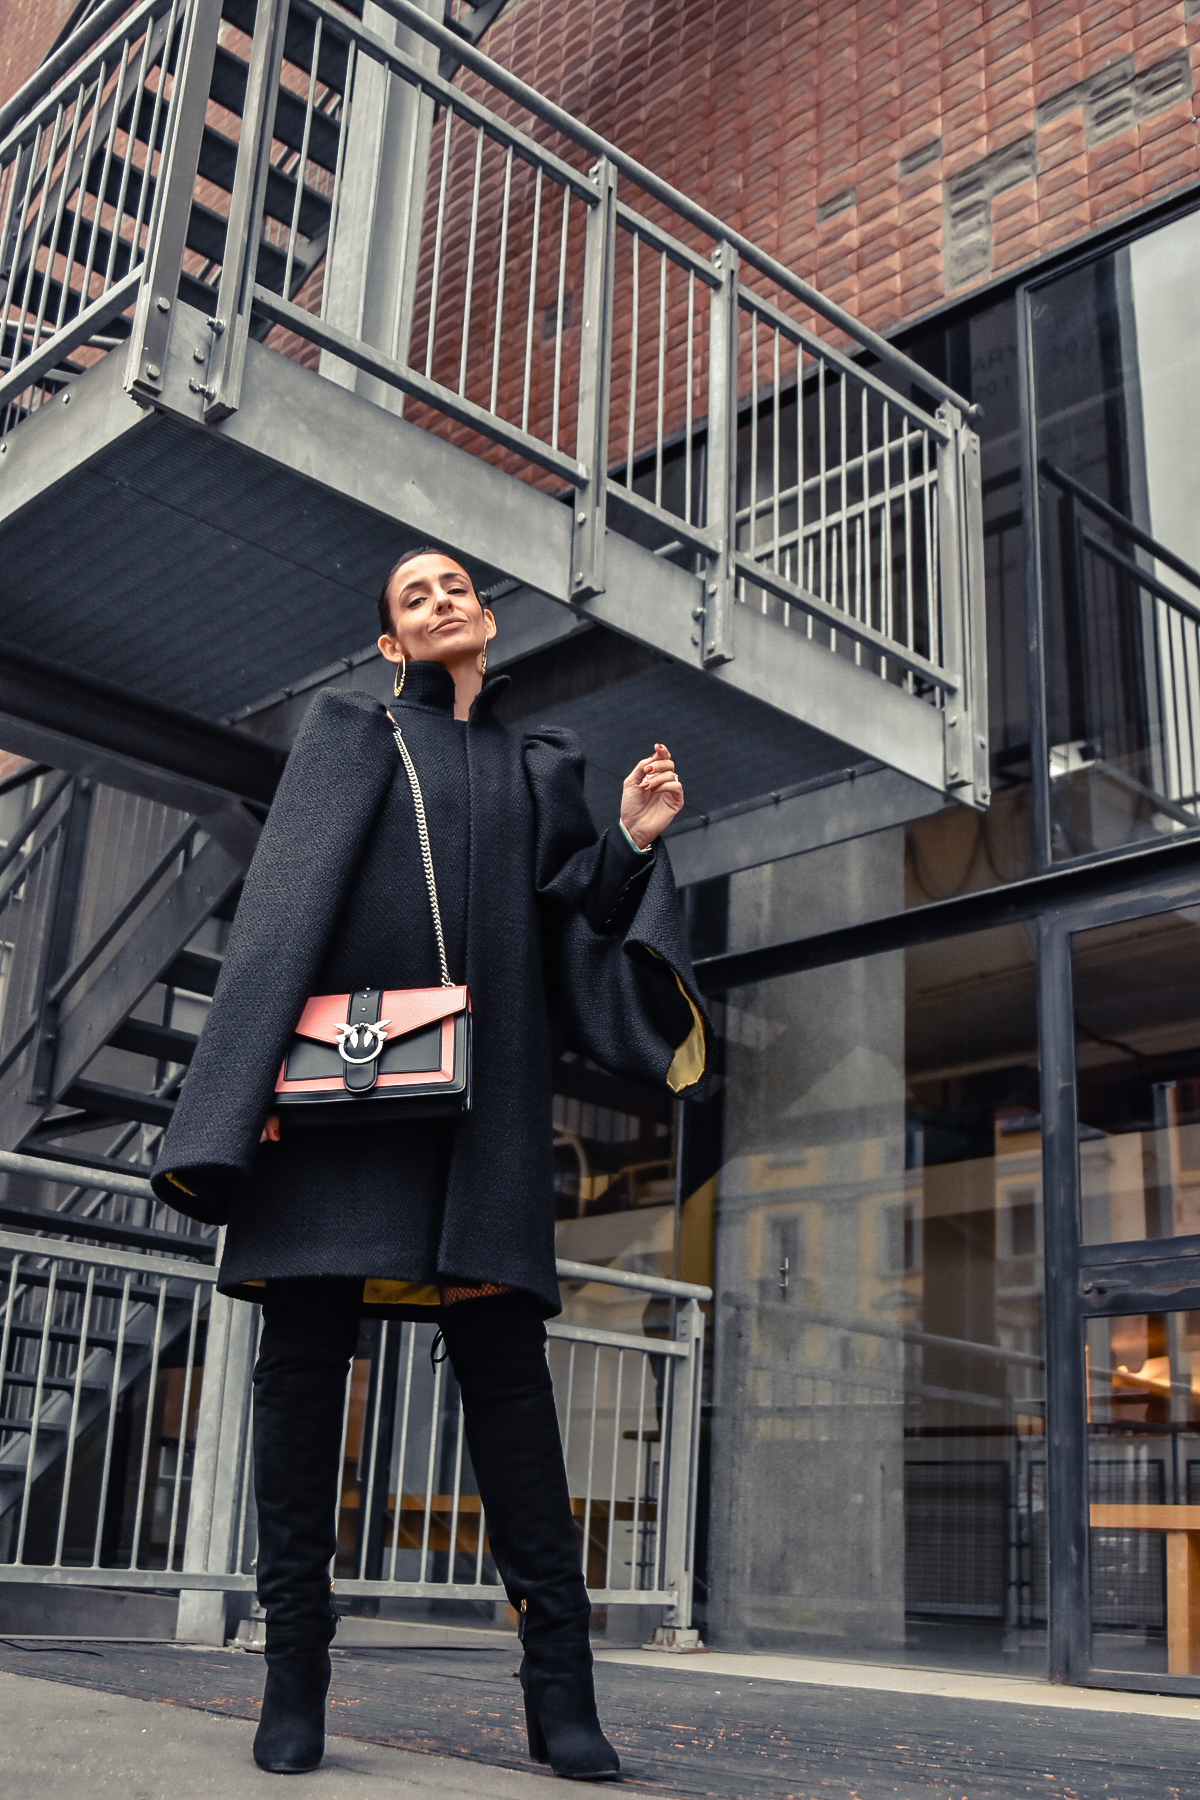 el-blog-de-silvia-fashion-blogger-street-style-mfw-abrigo-negro-07